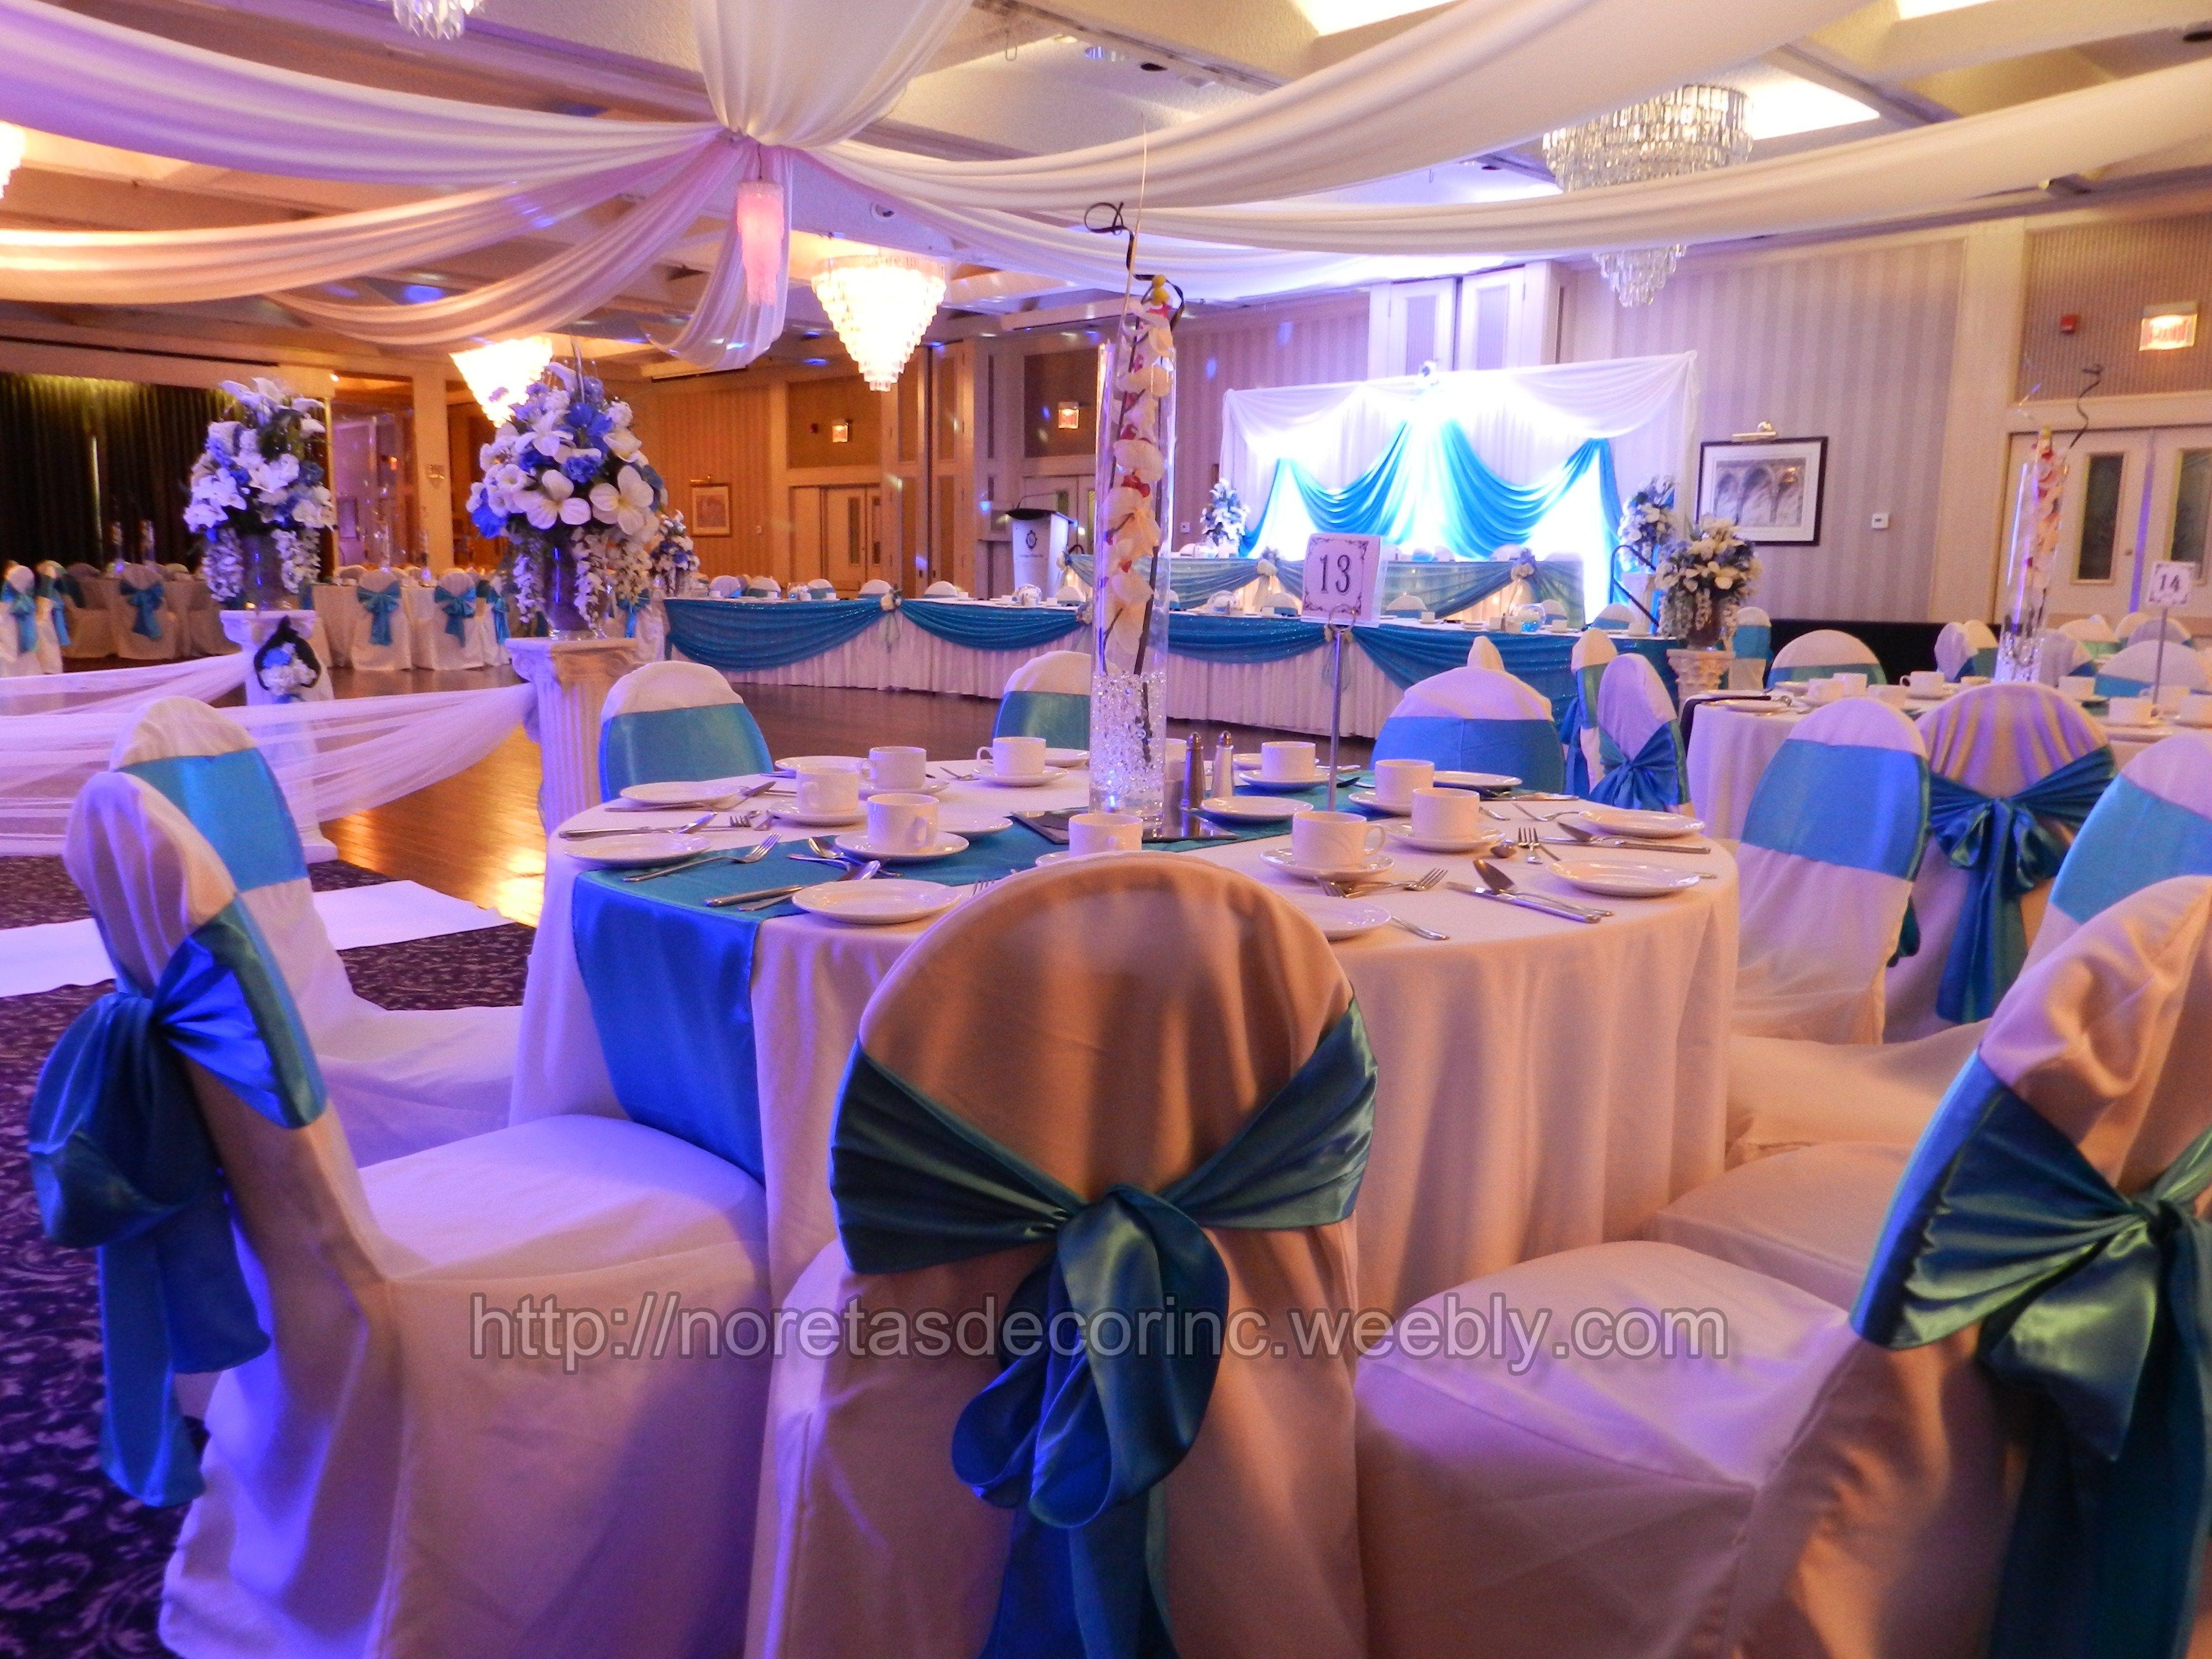 Banquet hall decoration wedding decoration ideas http banquet hall decoration wedding decoration ideas httpnoretasdecorincweebly junglespirit Gallery